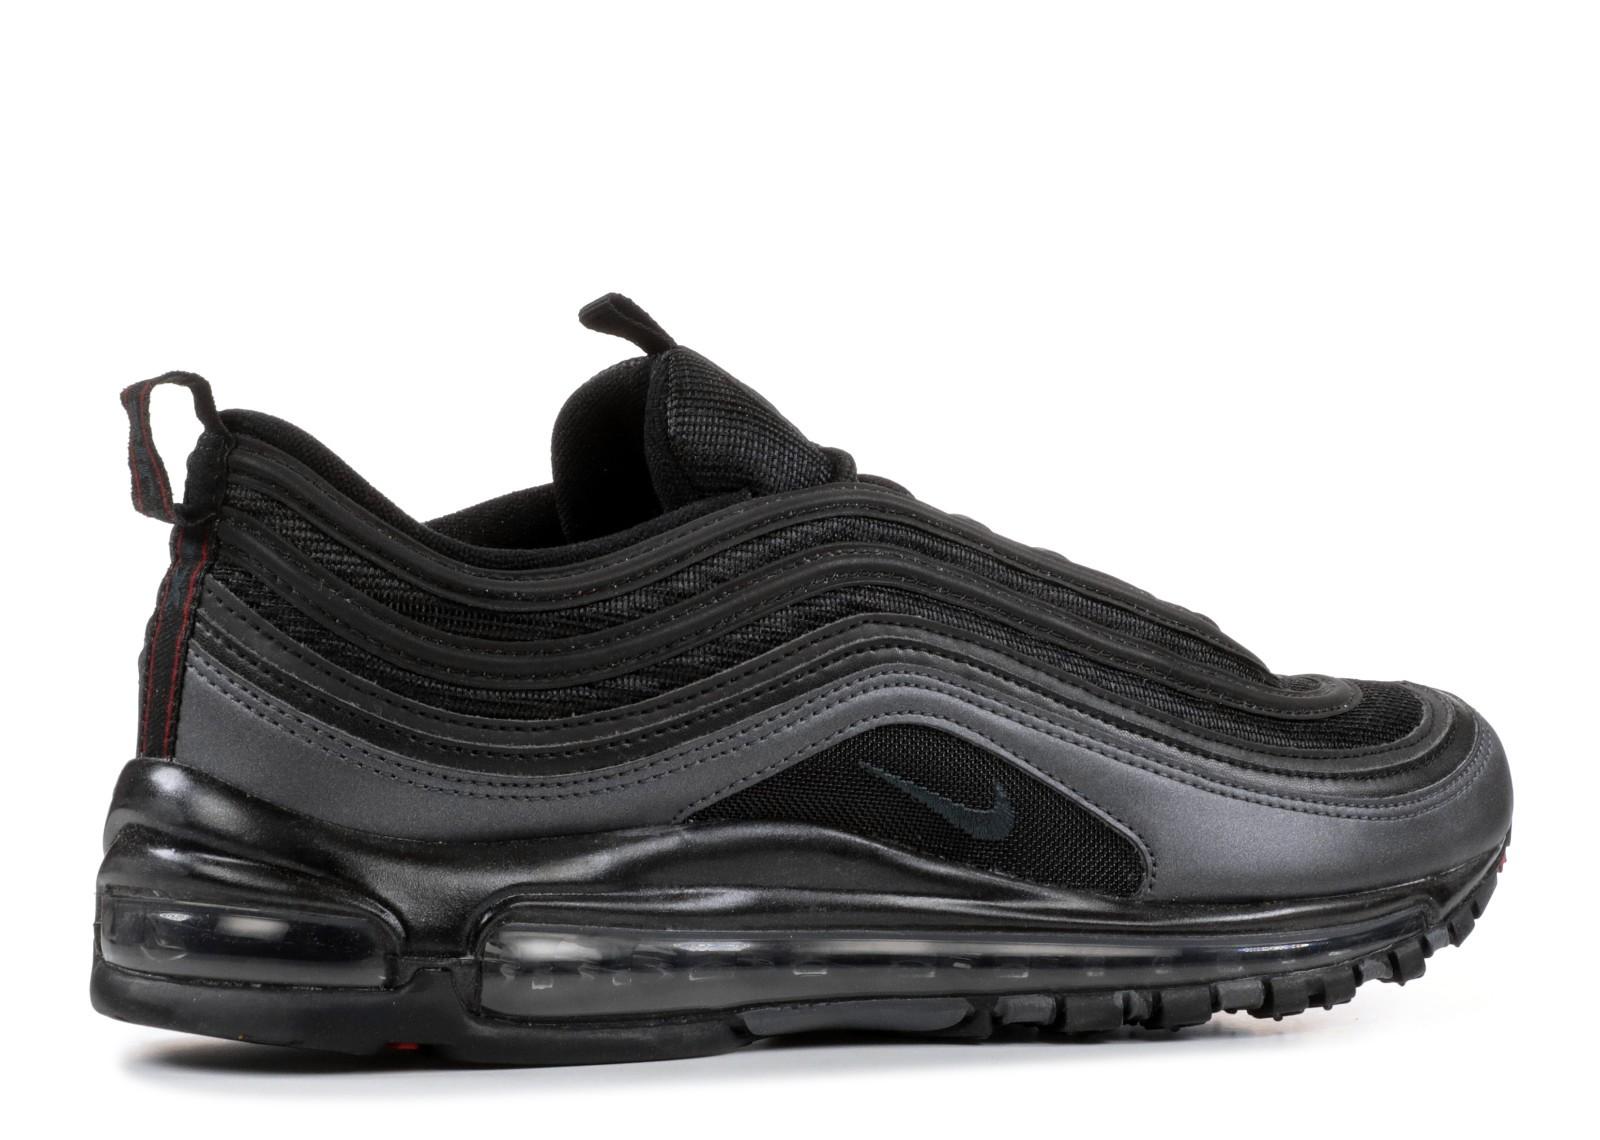 febabcdfdf Nike Air Max 97 Metallic Hematite Black Anthracite 921826-005 - Febbuy